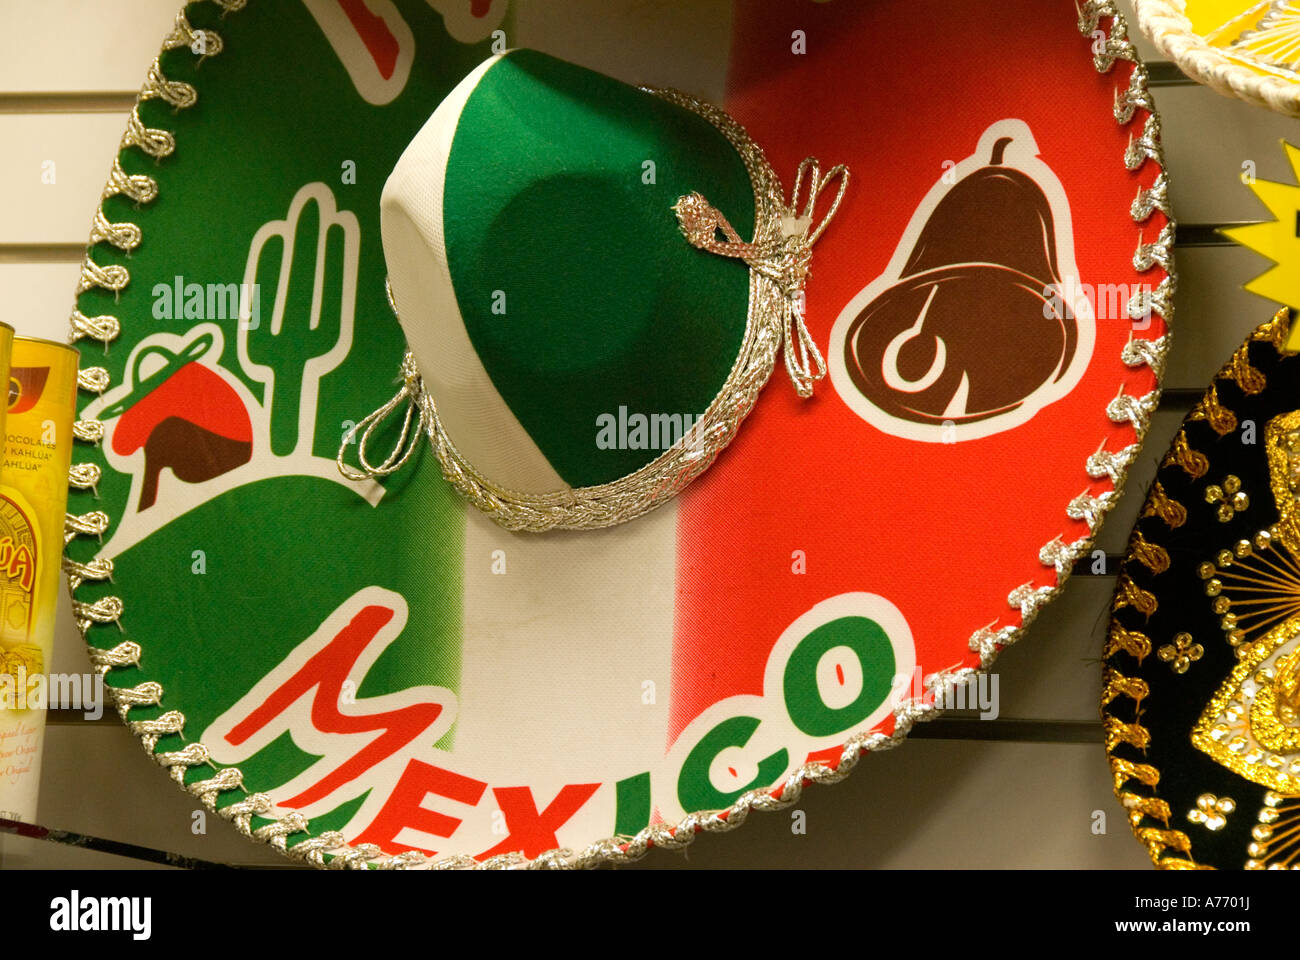 Sombrero Mexico Souvenirs Hat Imágenes De Stock   Sombrero Mexico ... 319969cd4a0